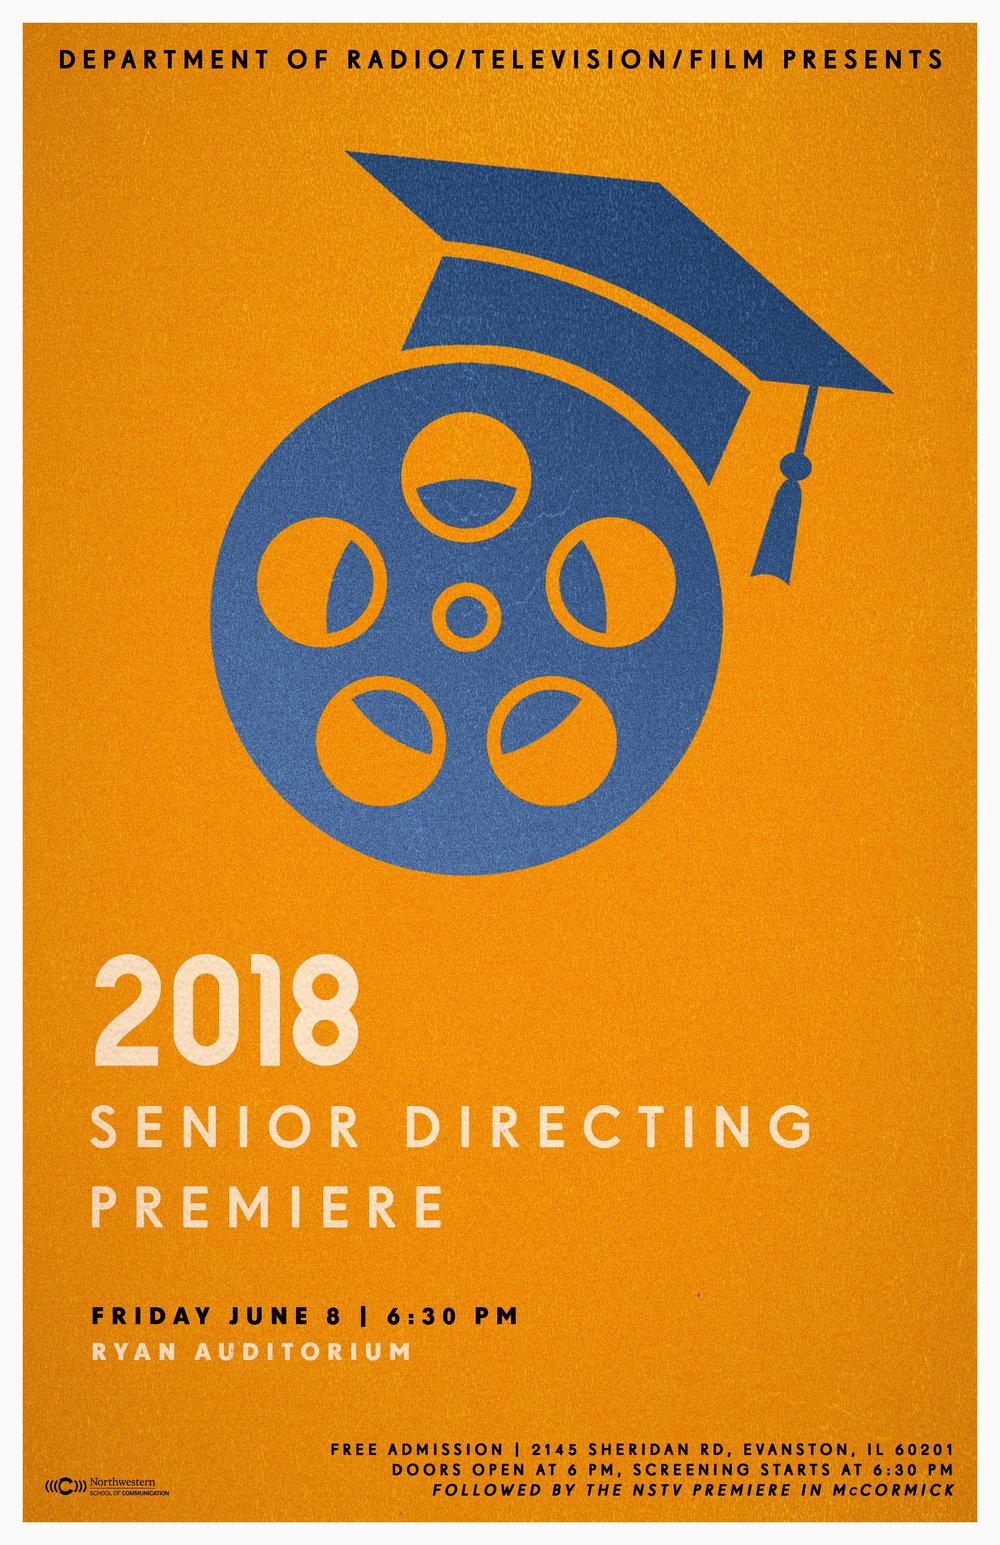 2018 Senior Directing Premiere